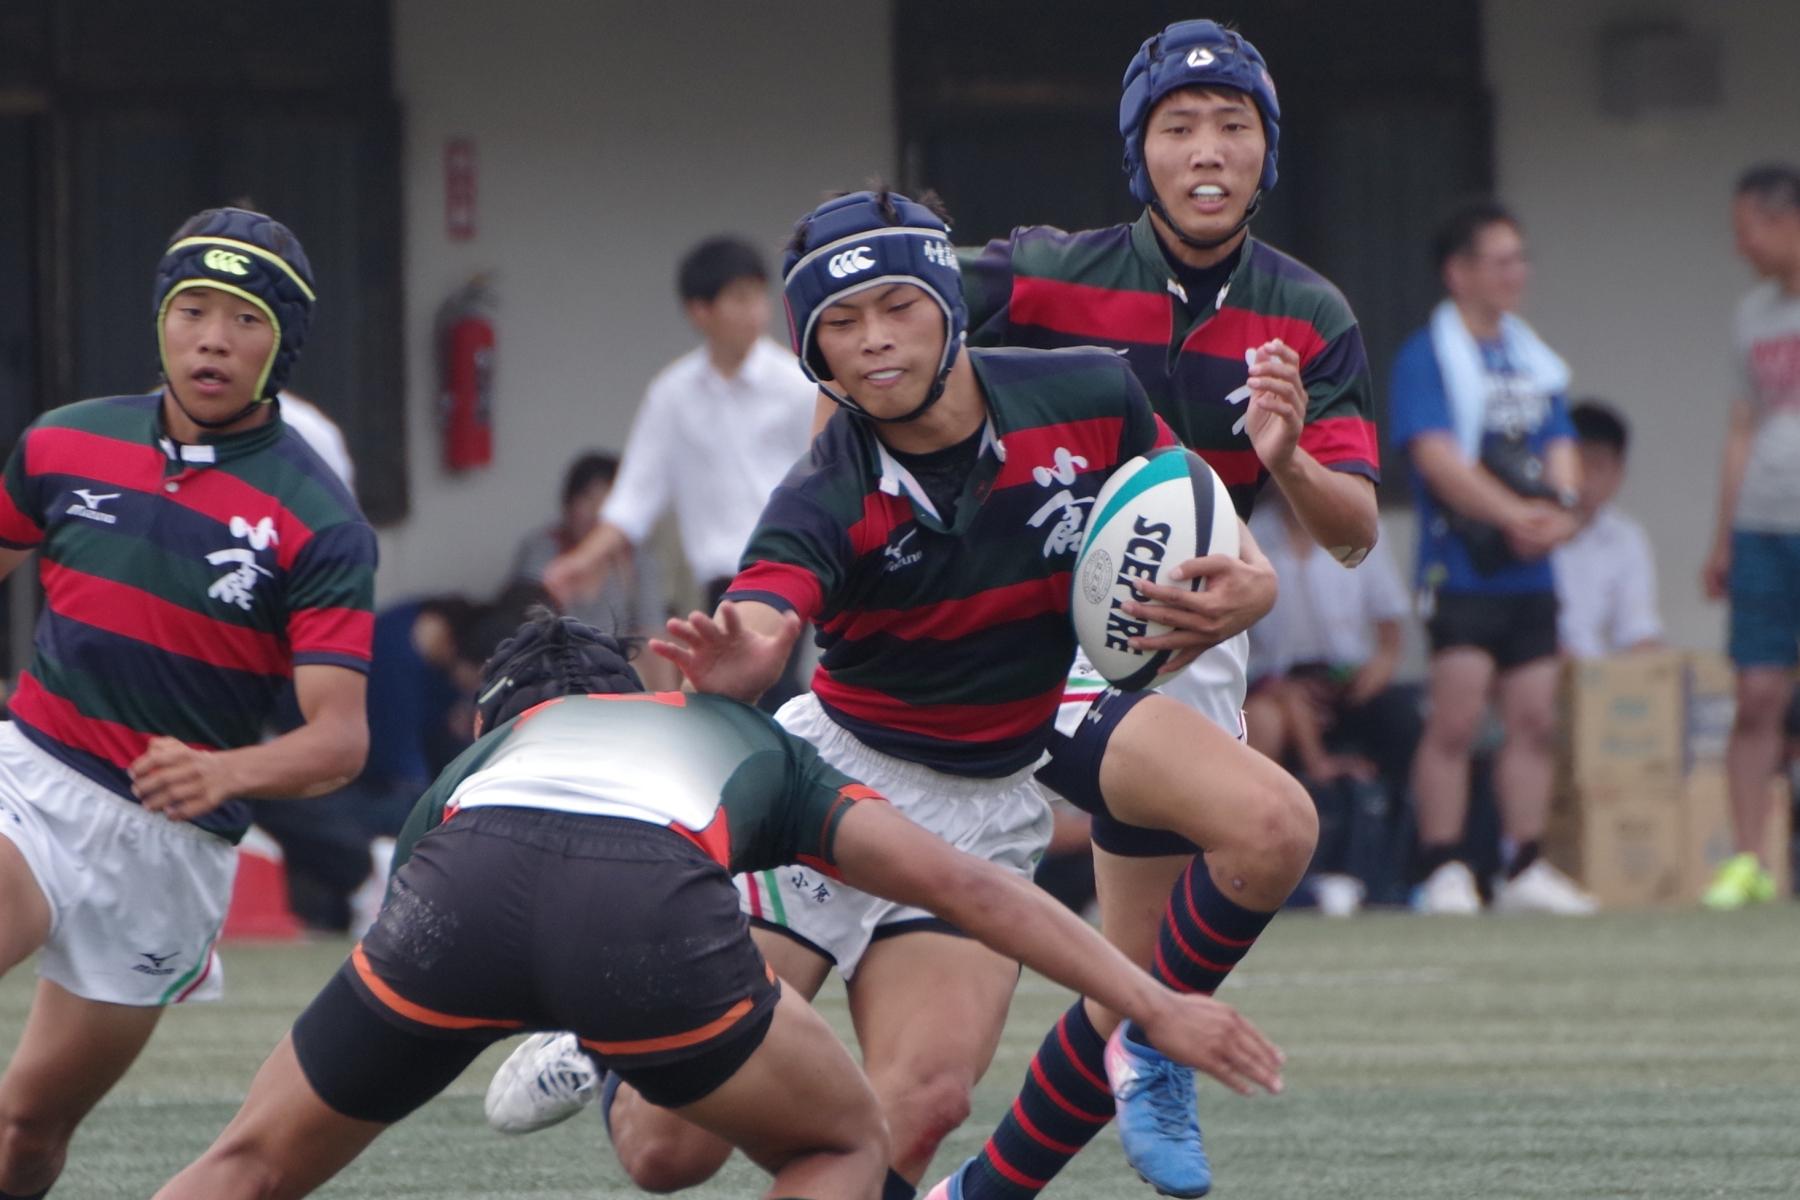 http://kokura-rugby.sakura.ne.jp/180610_112704_0646.jpg